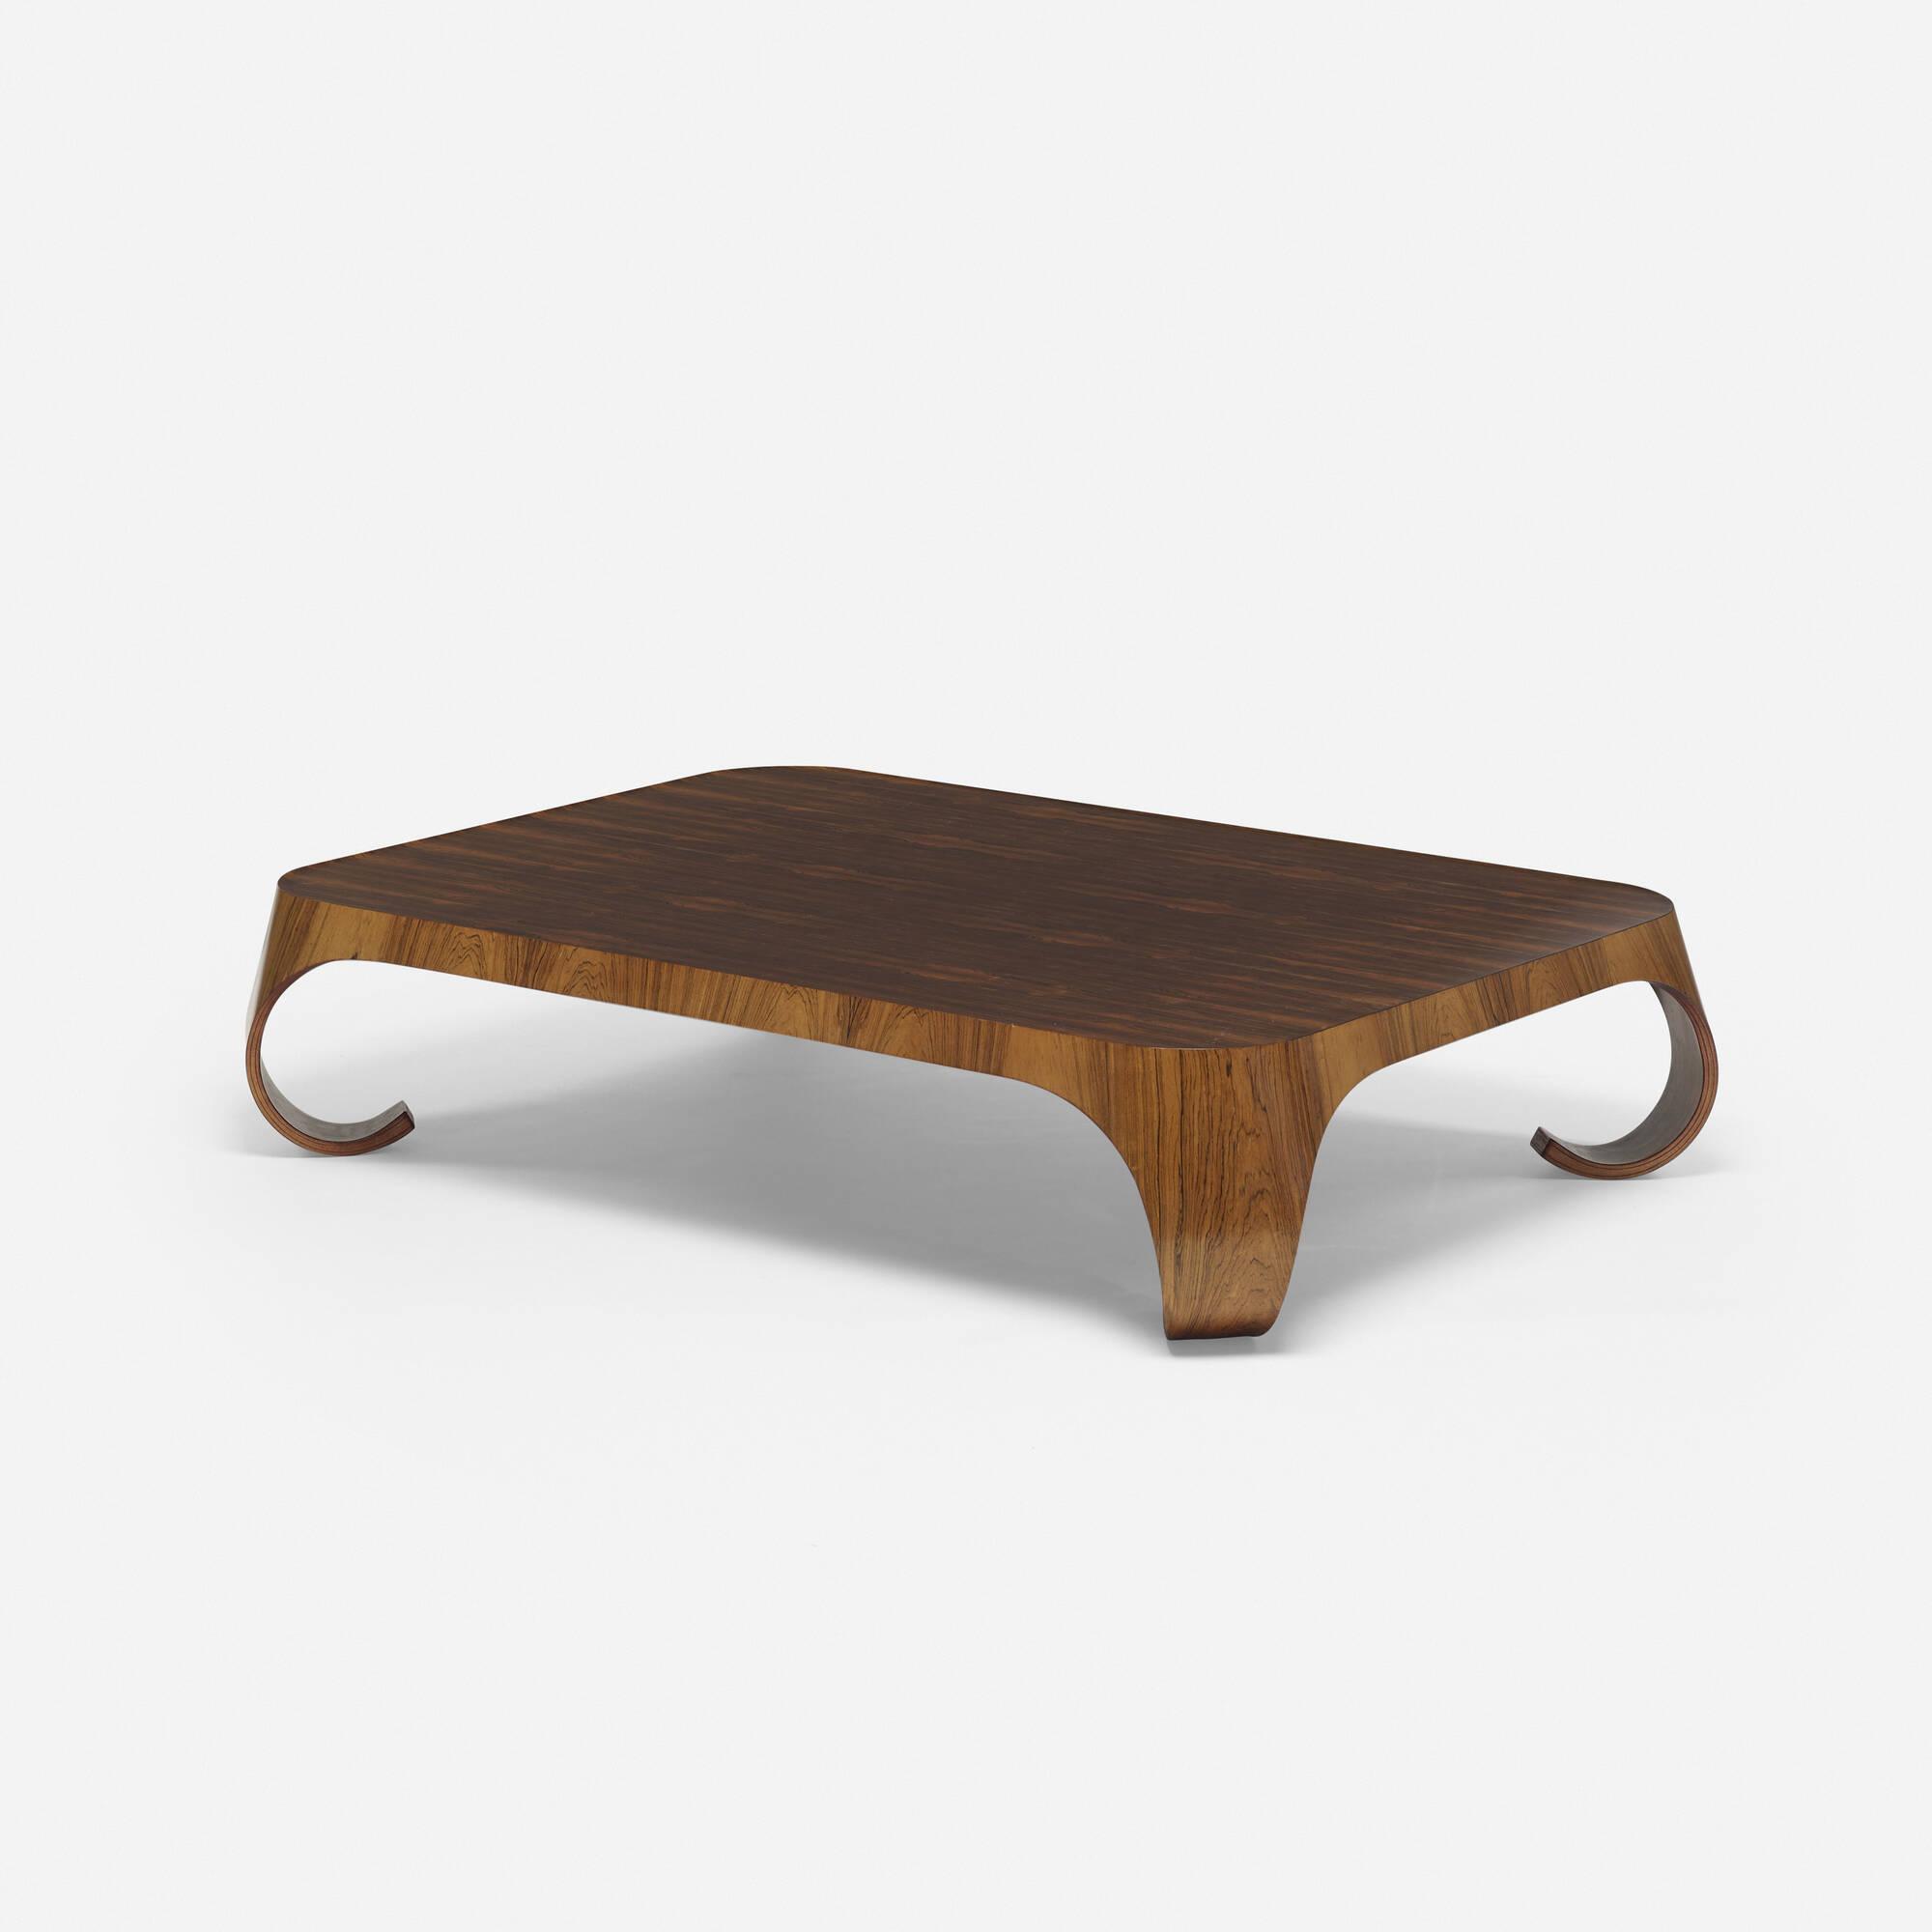 139 isamu kenmochi coffee table living contemporary 19 139 isamu kenmochi coffee table 1 of 3 geotapseo Choice Image